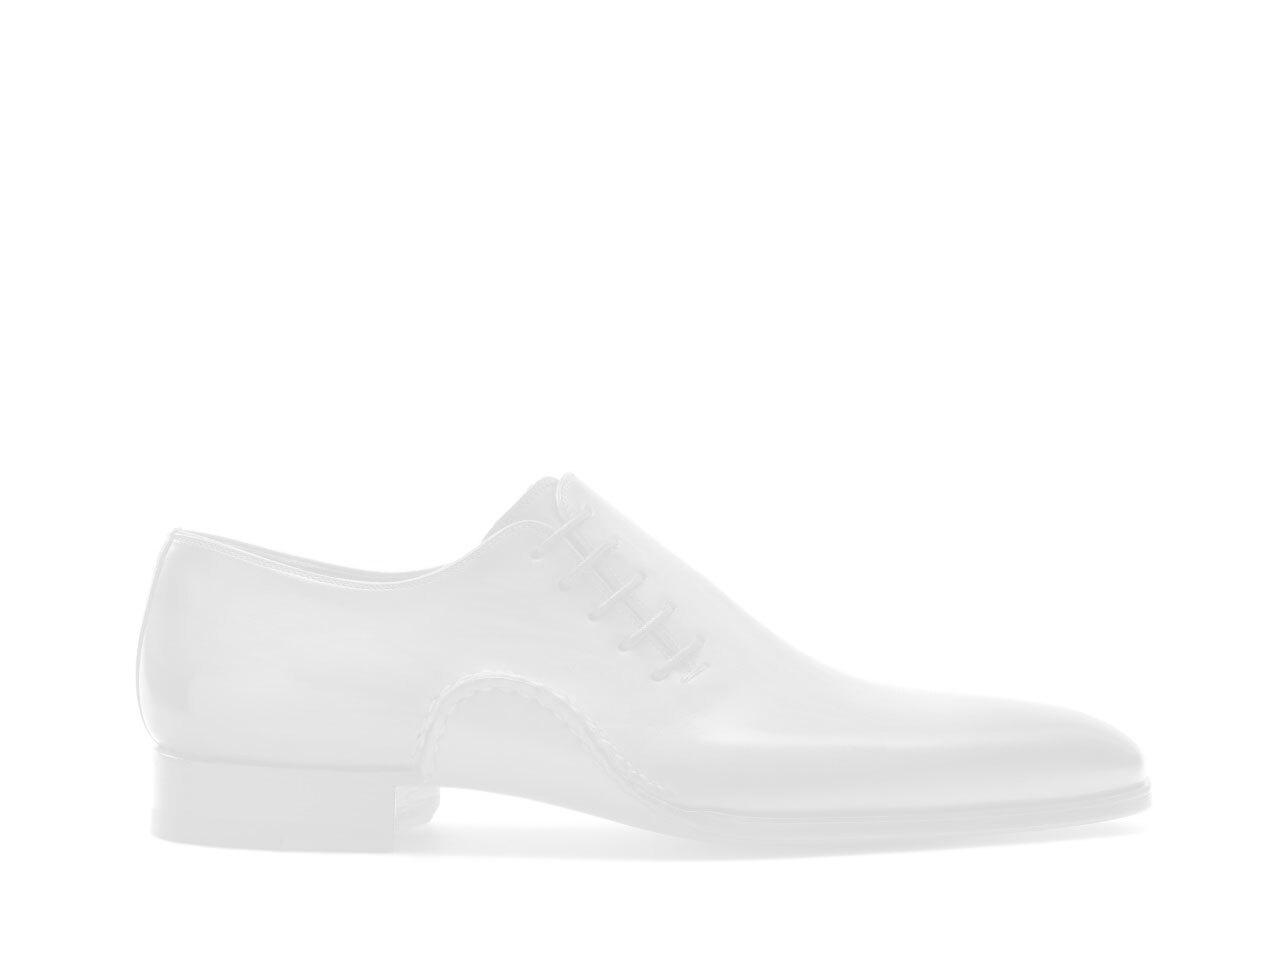 Pair of the Magnanni Berceo Black Men's Sneakers